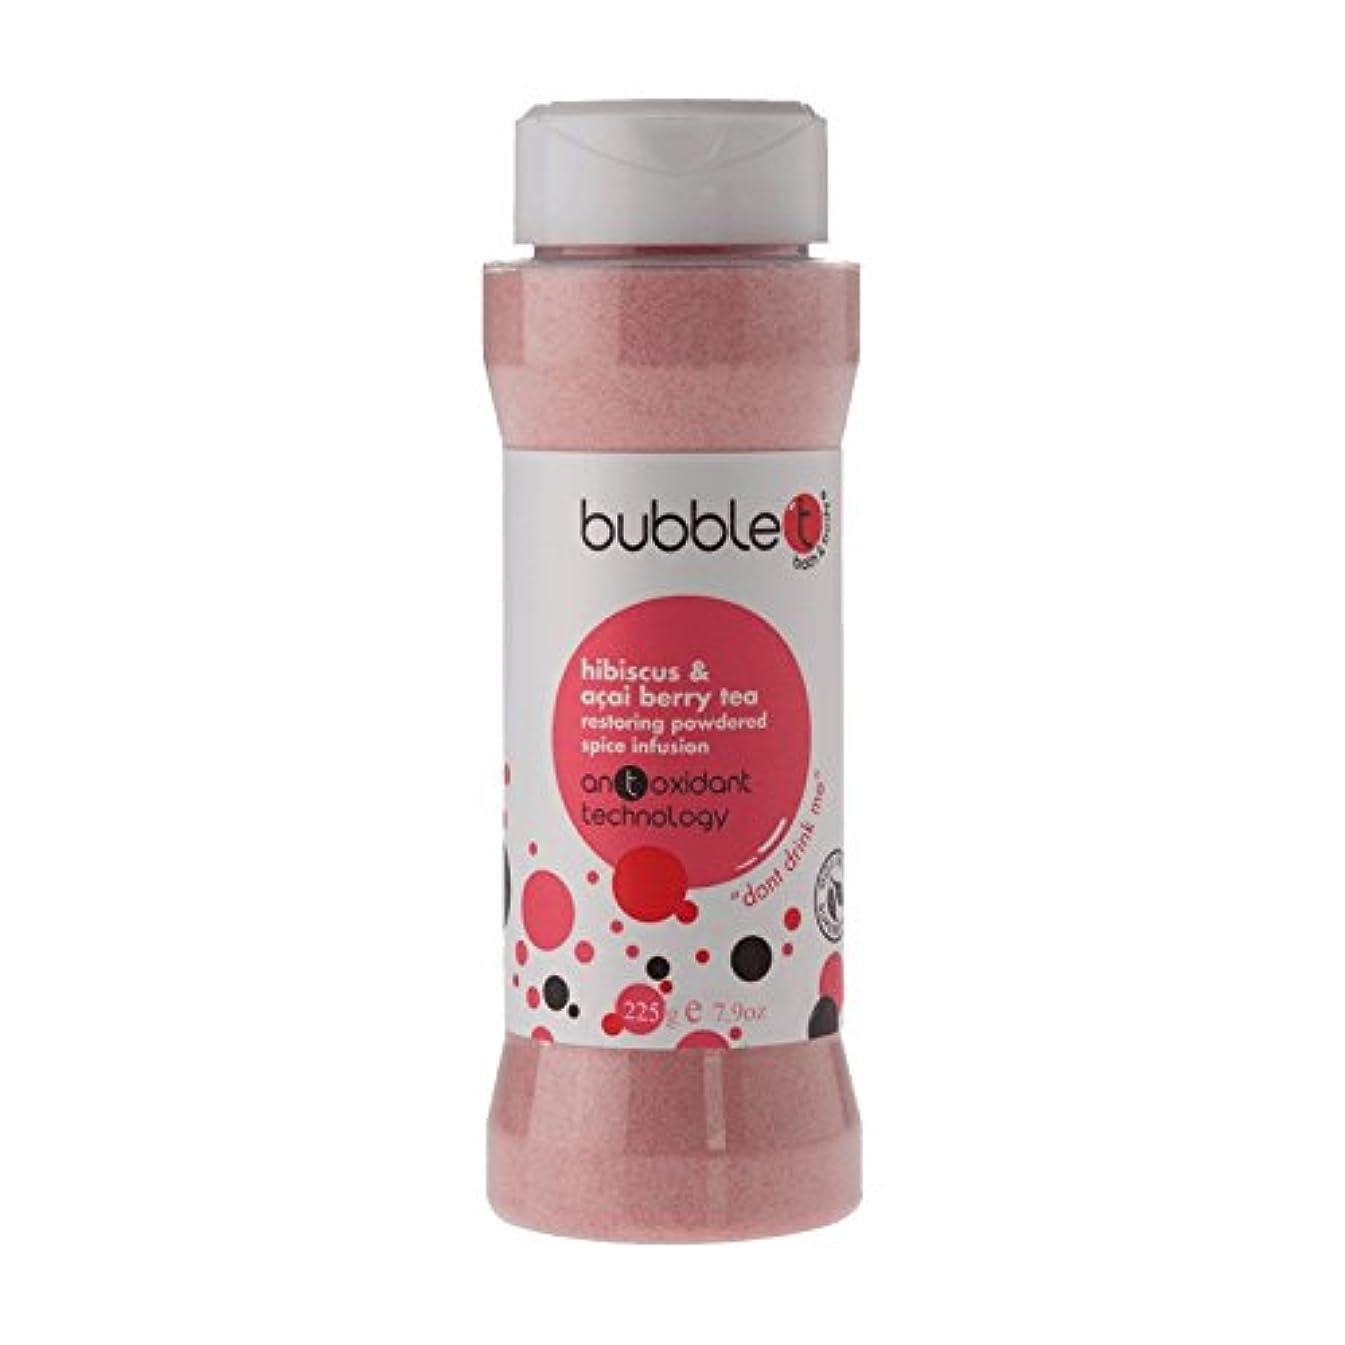 Bubble T Bath Spice Infusion Hibiscus & Acai Berry Tea 225g (Pack of 2) - バブルトン風呂スパイス注入ハイビスカス&アサイベリー茶225グラム (x2...